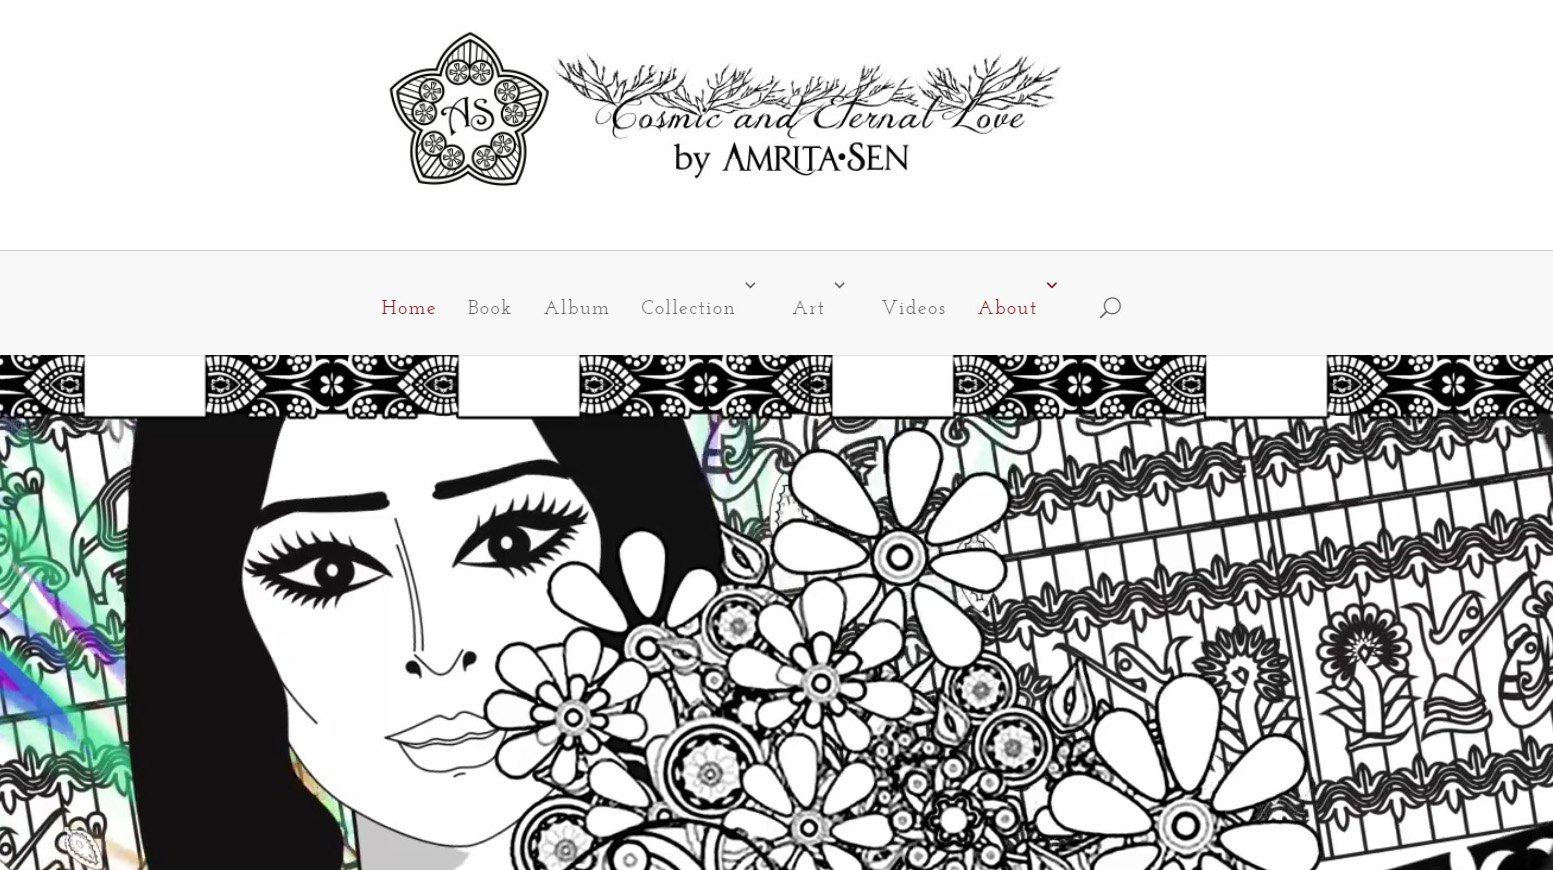 Compliments From Visual Artist & Musician Amrita Sen